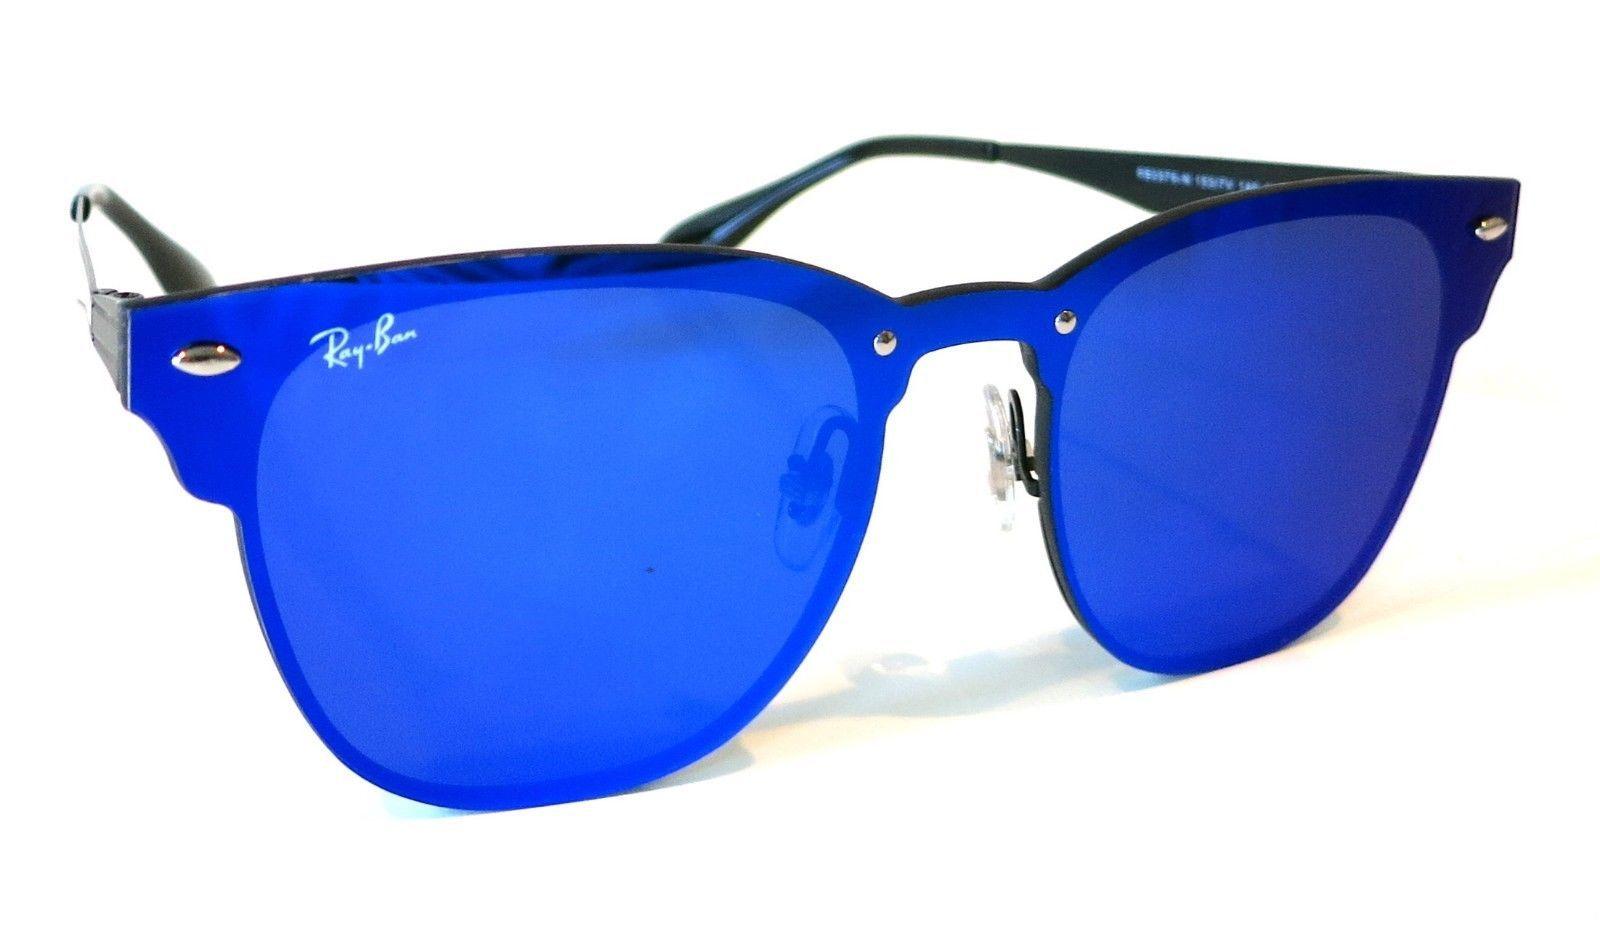 31ba98a4d9 Rayban Blaze Clubmaster Sunglasses RB3576N 153 7V 47 Violet Blue Mirror club